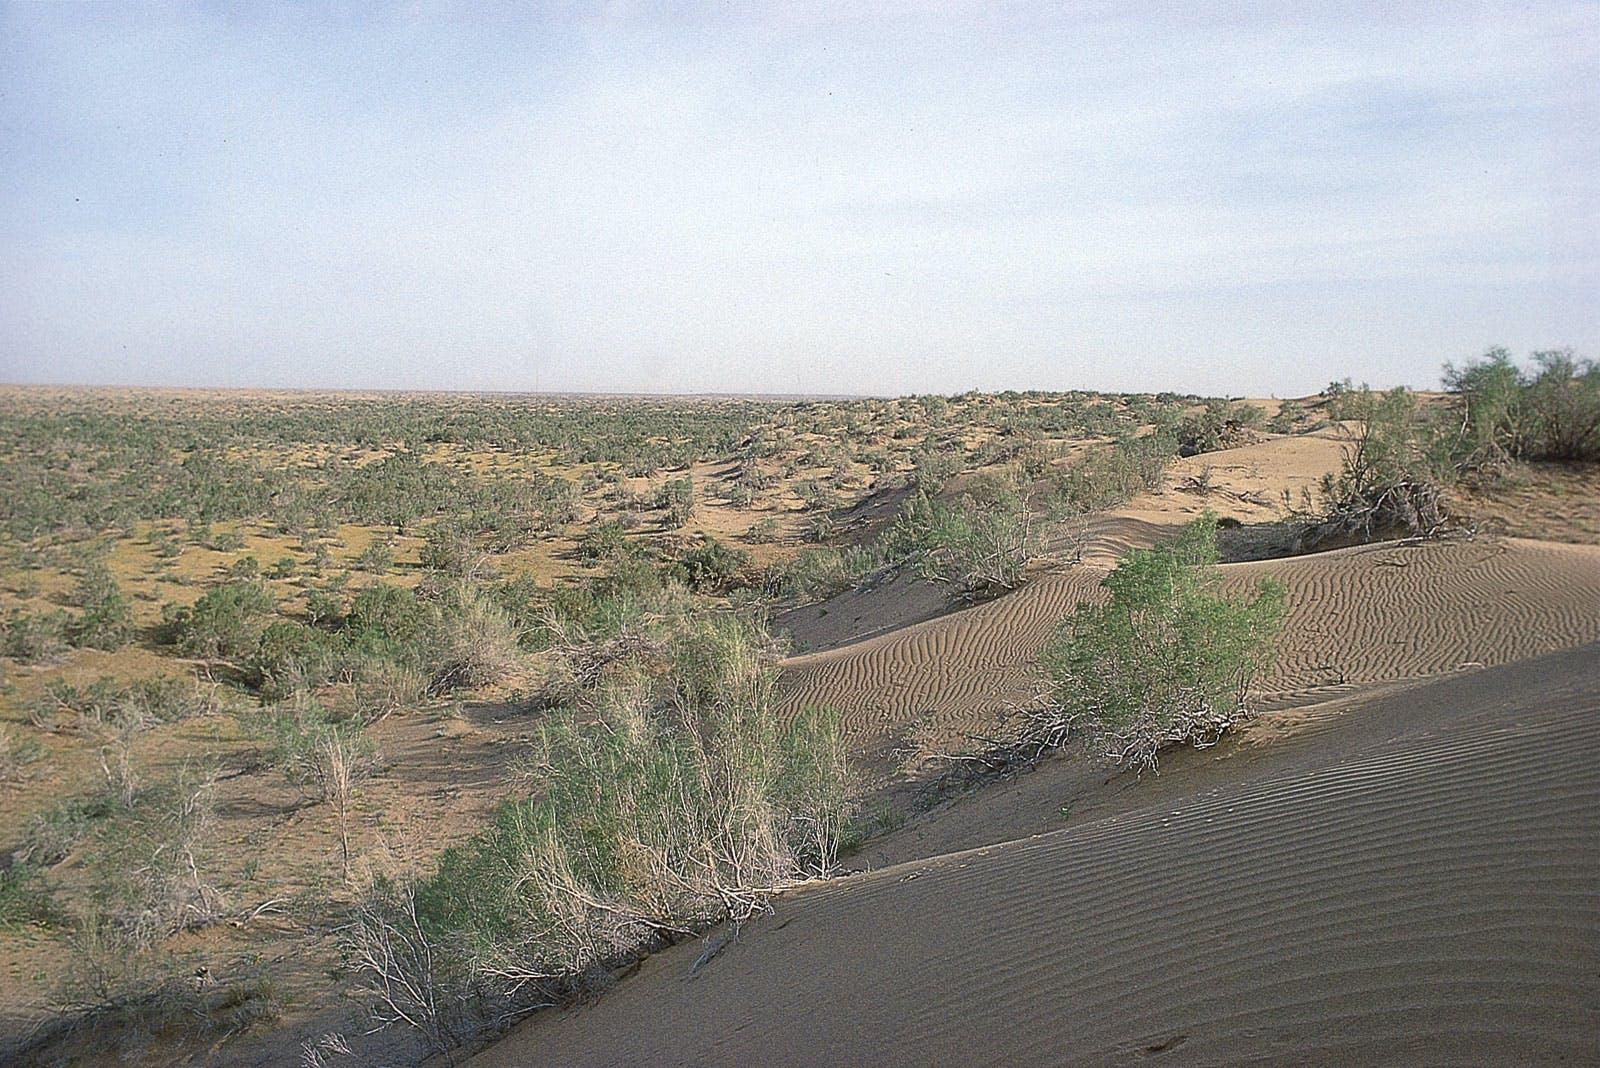 Central Asian Southern Desert